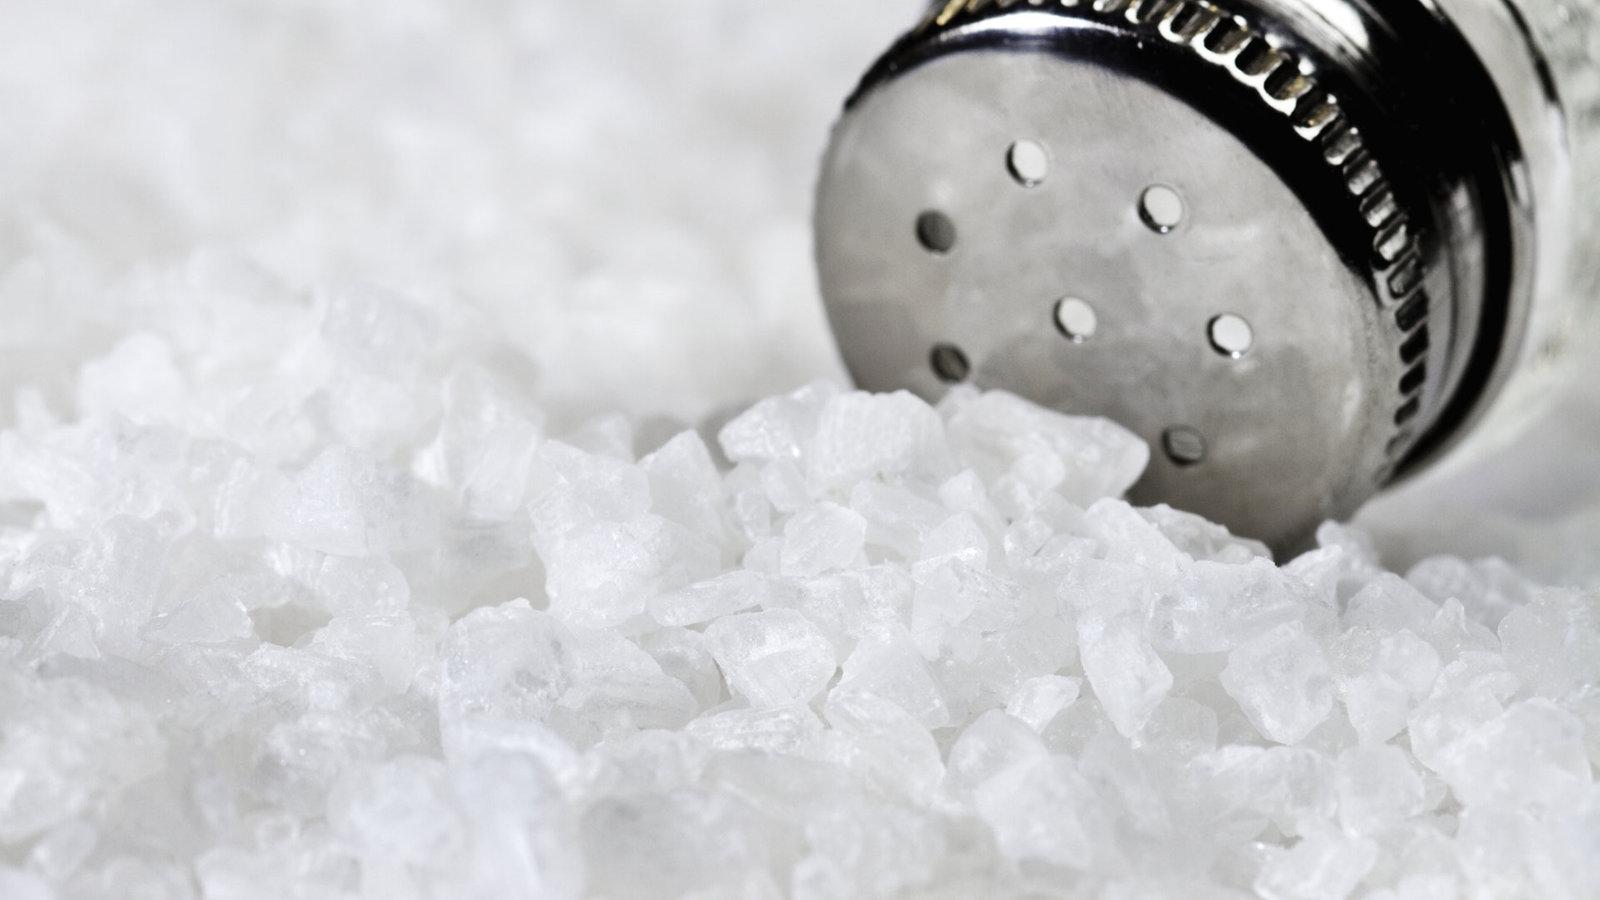 Wetter Salz